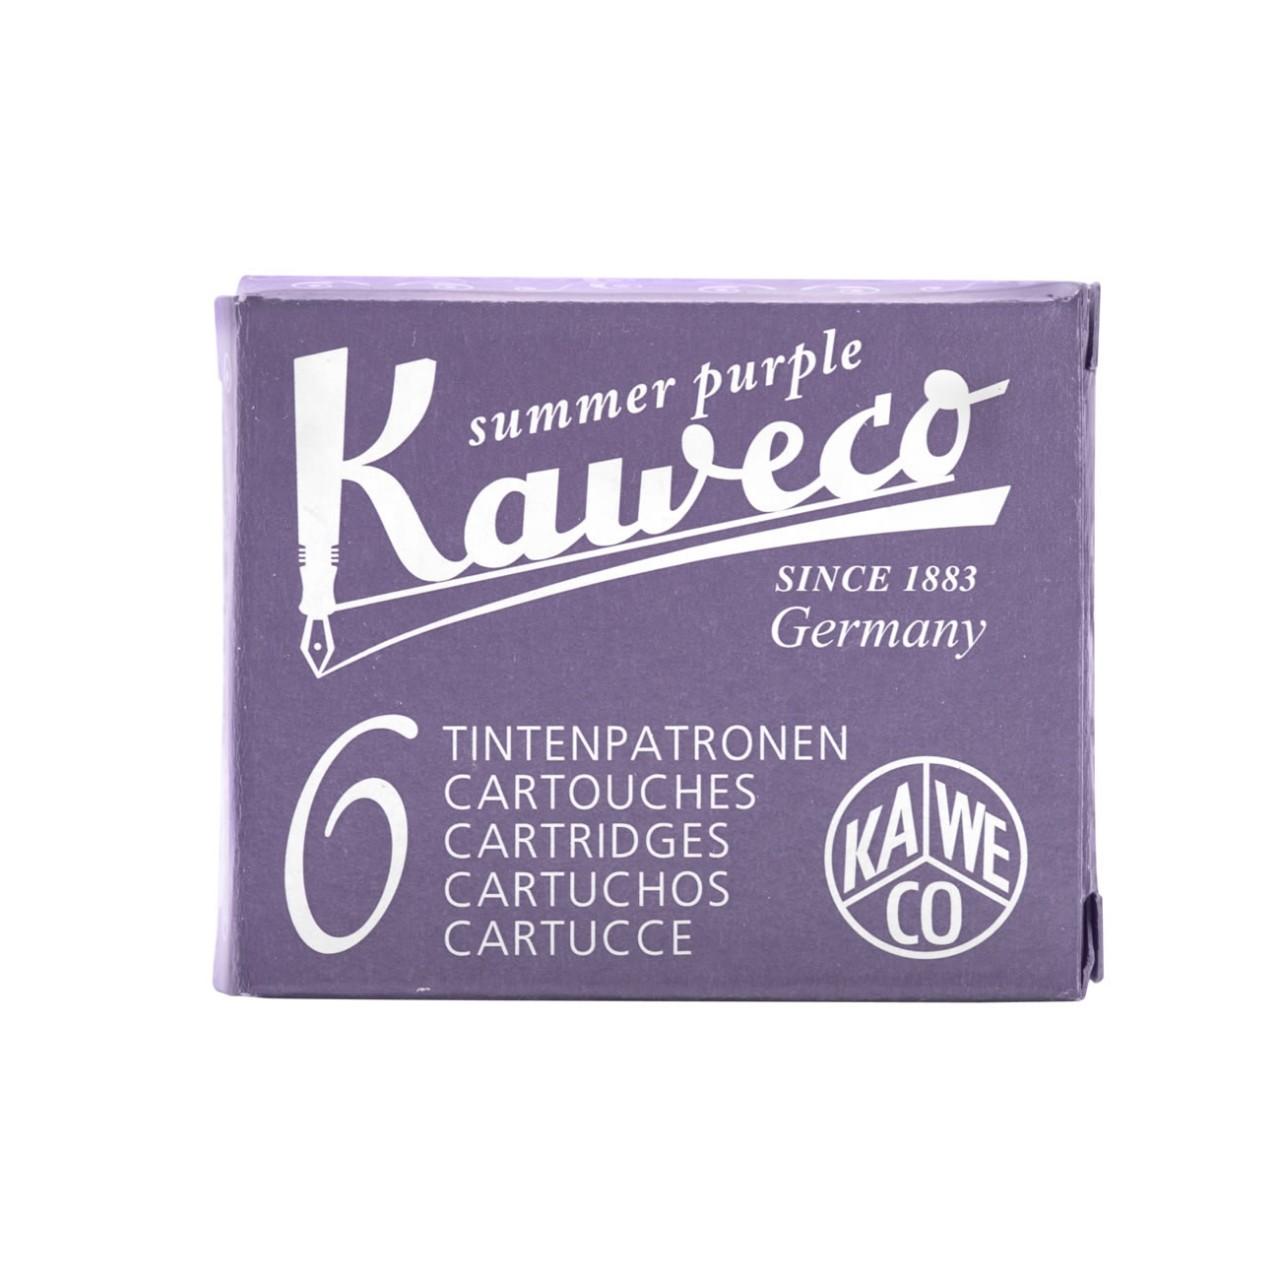 Kaweco Tintenpatronen 6 Stück sommerlila VE=20 Pack